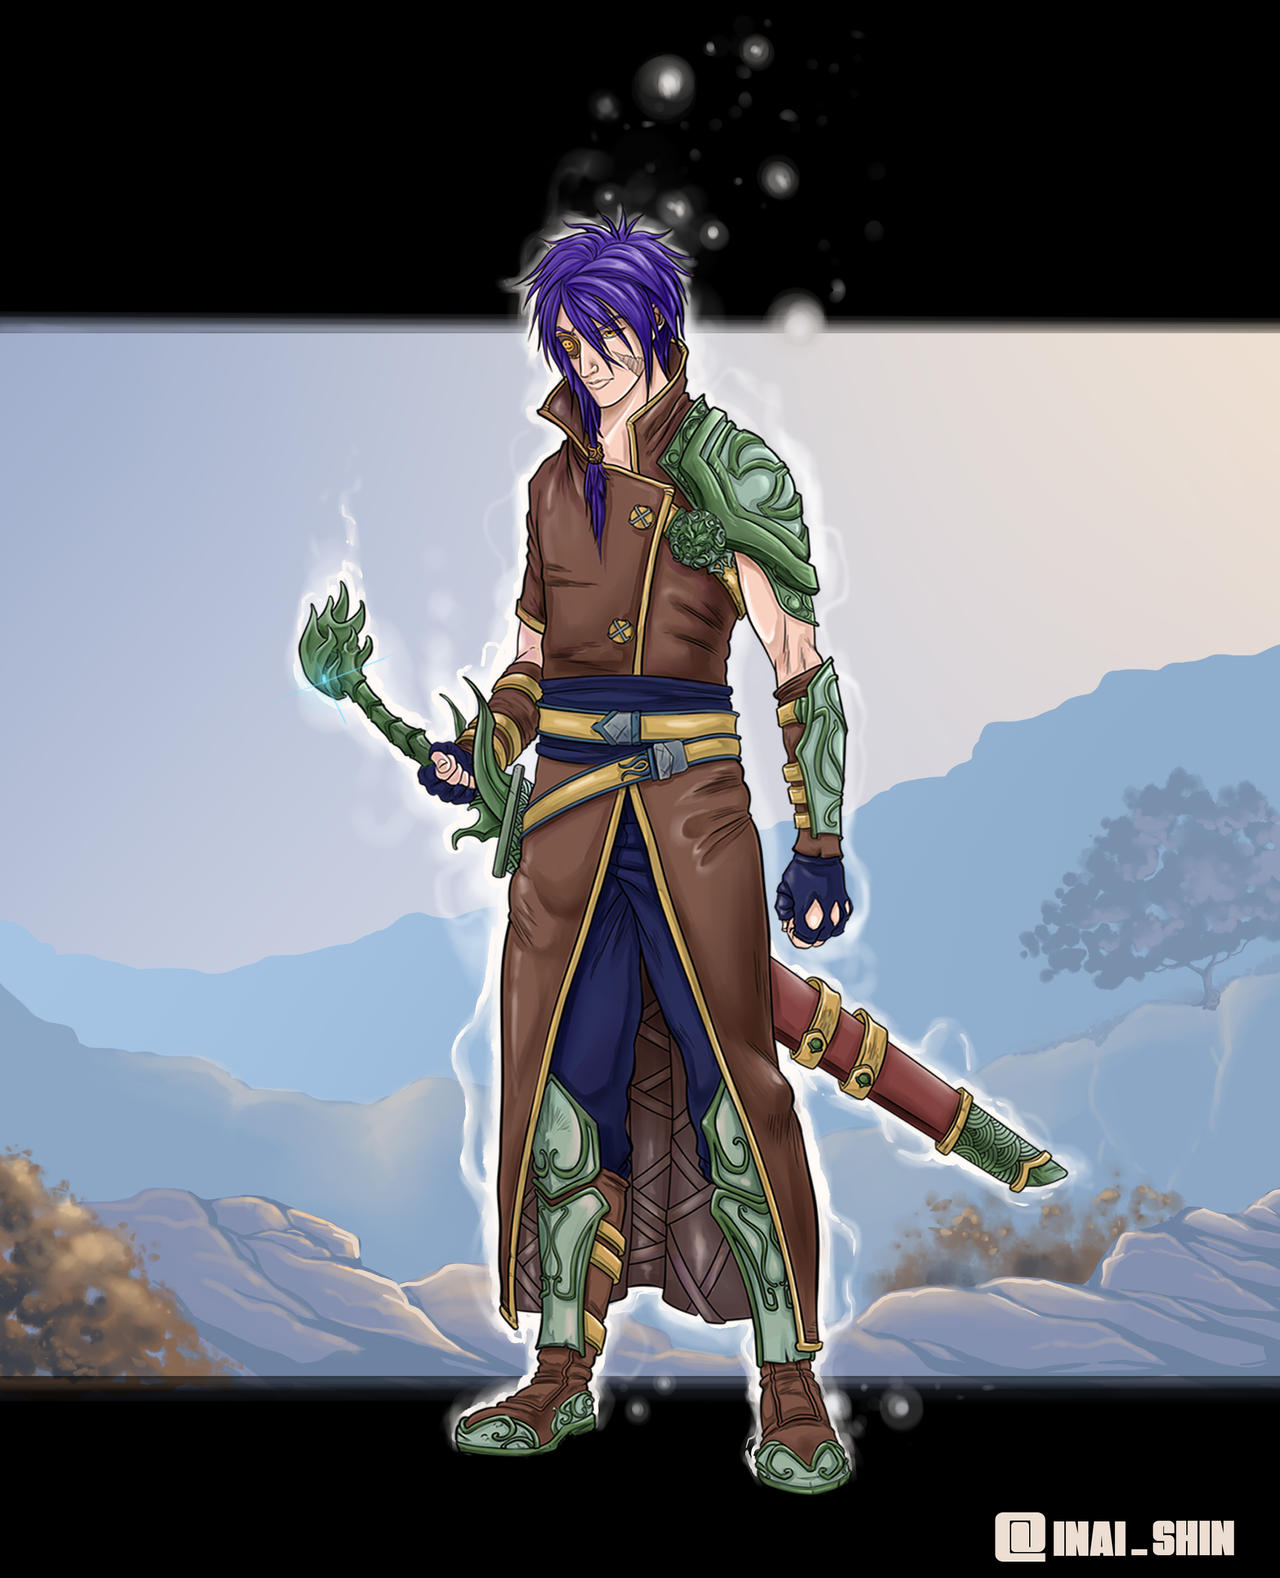 Sorcerer-Thief